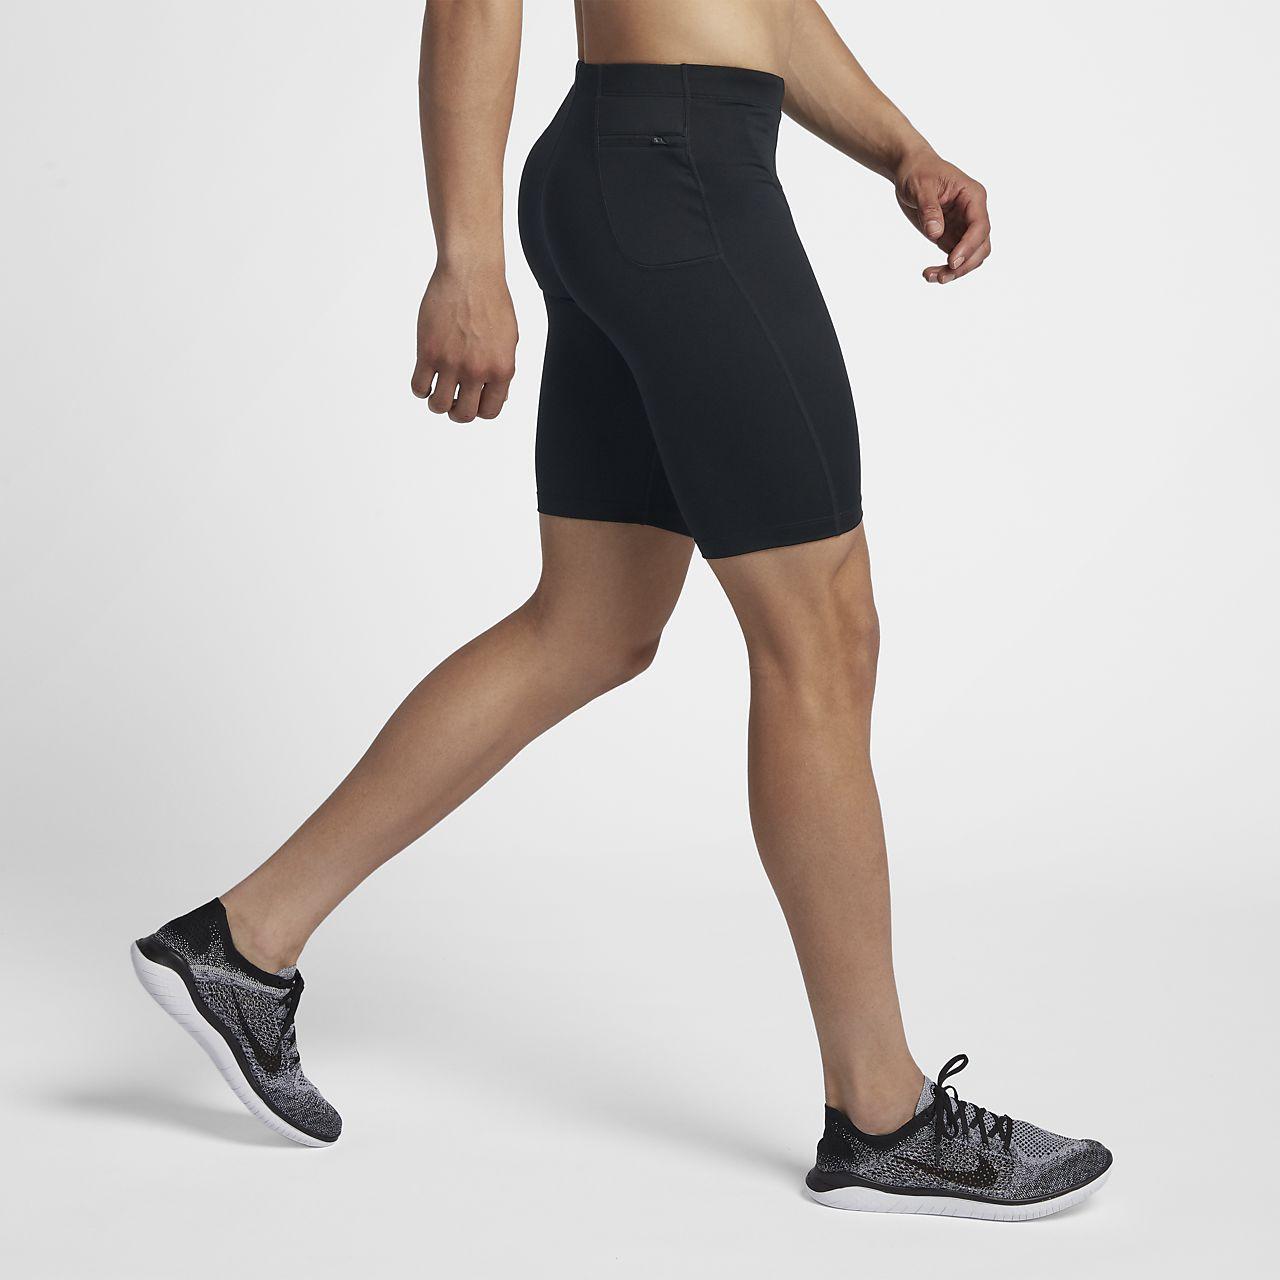 Knee Length Running Skirts - raveitsafe